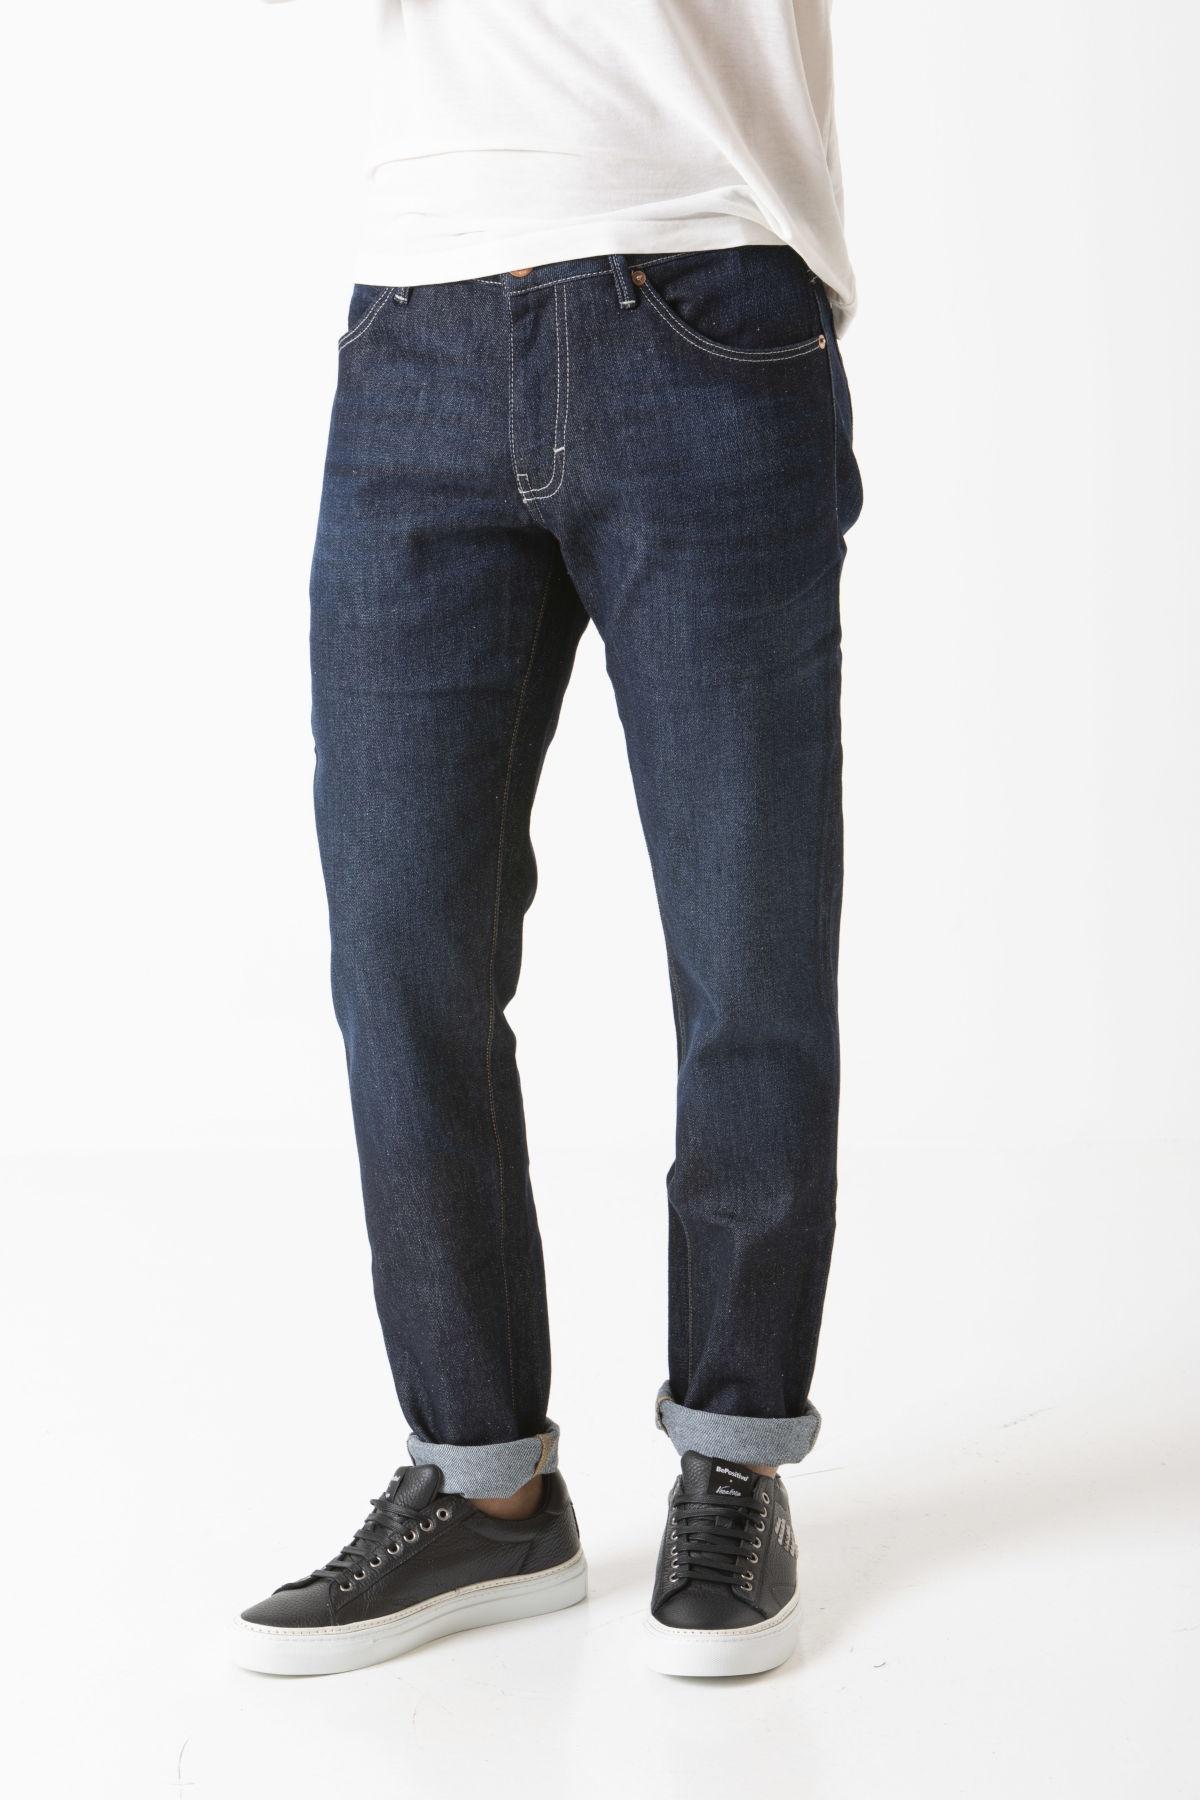 Herren Jeans PT05 H/W 19-20